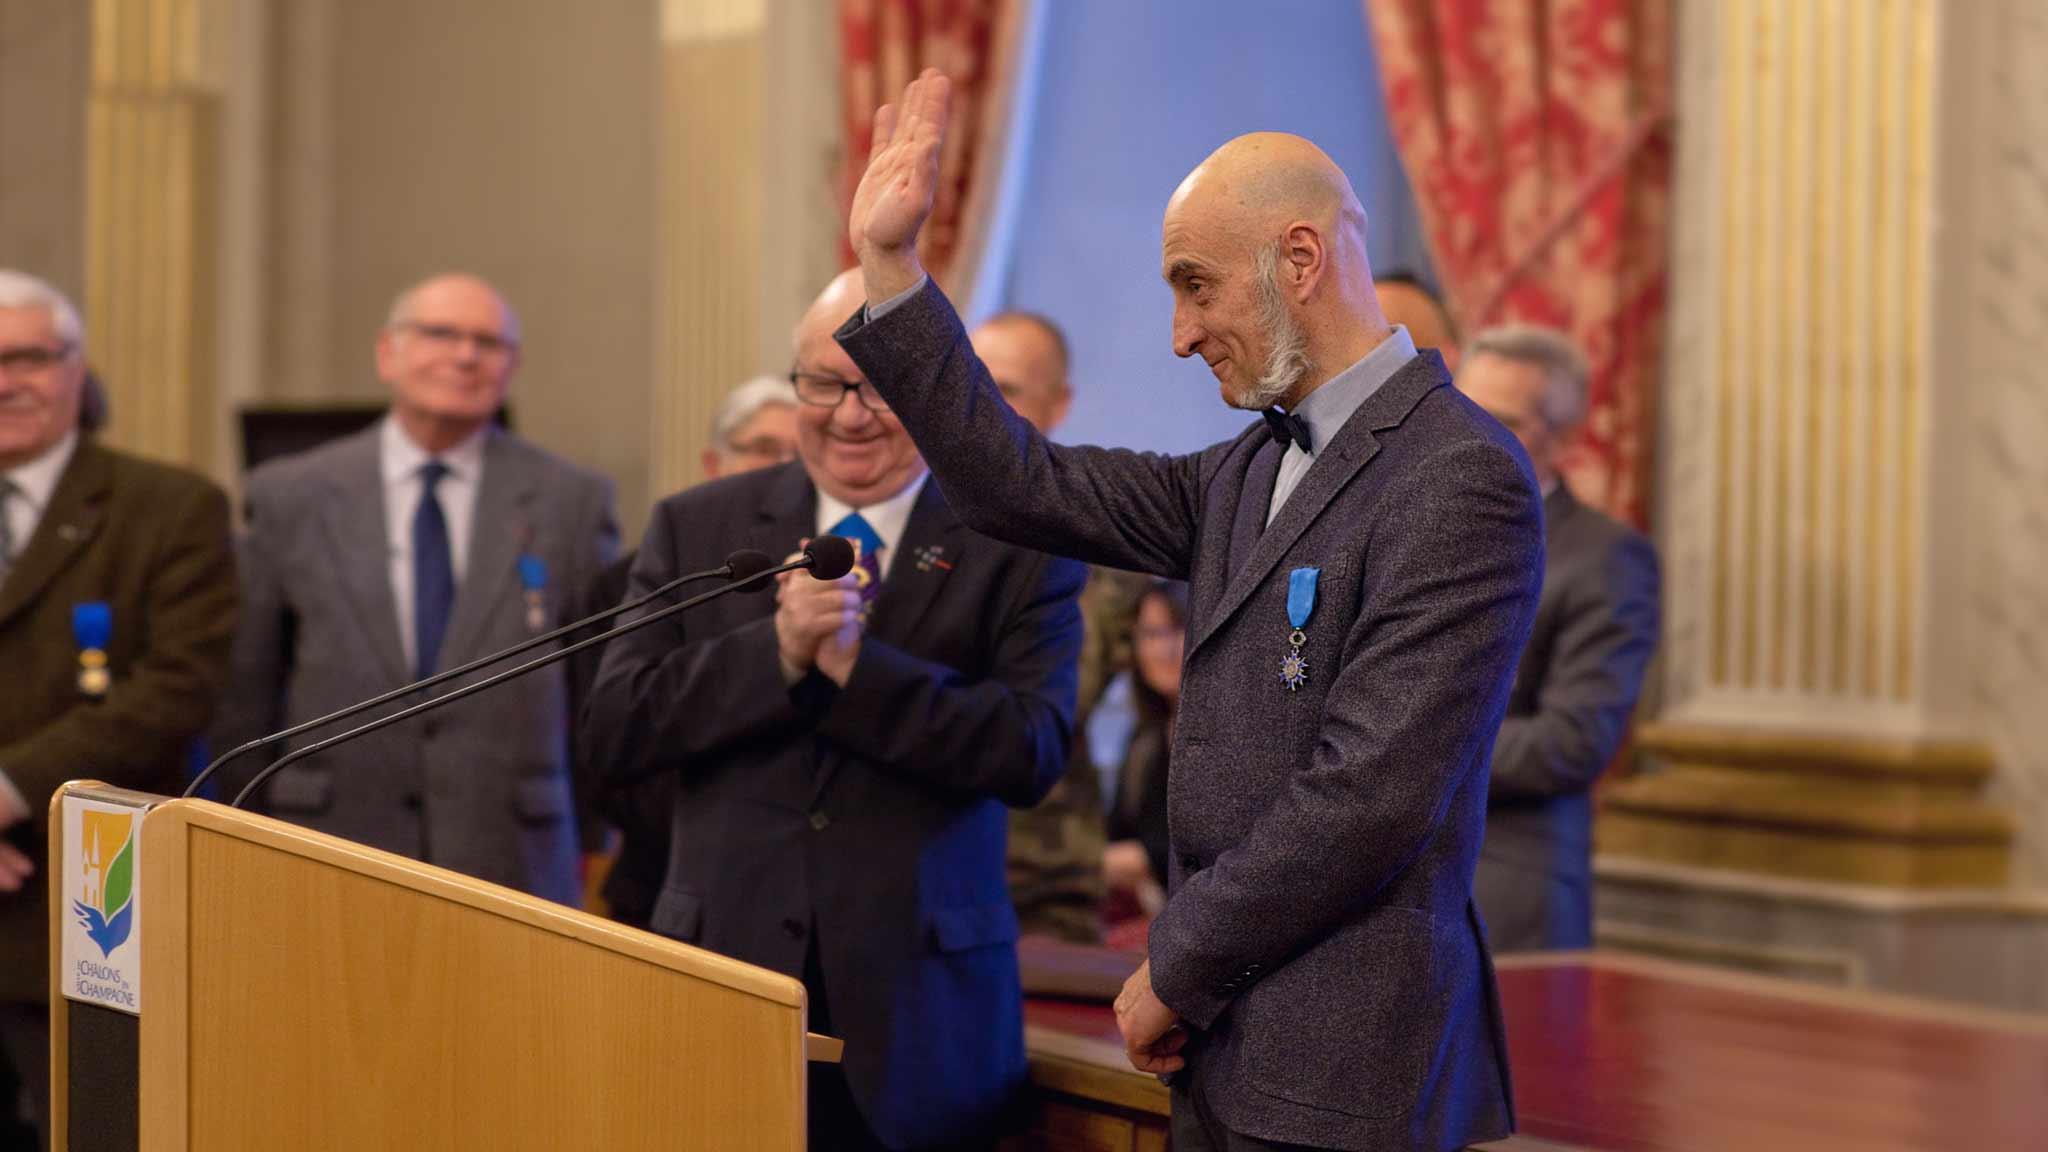 reportage photo mairie politique election campagne electorale evenementiel discours nancy 54 marne 51 lorraine 54